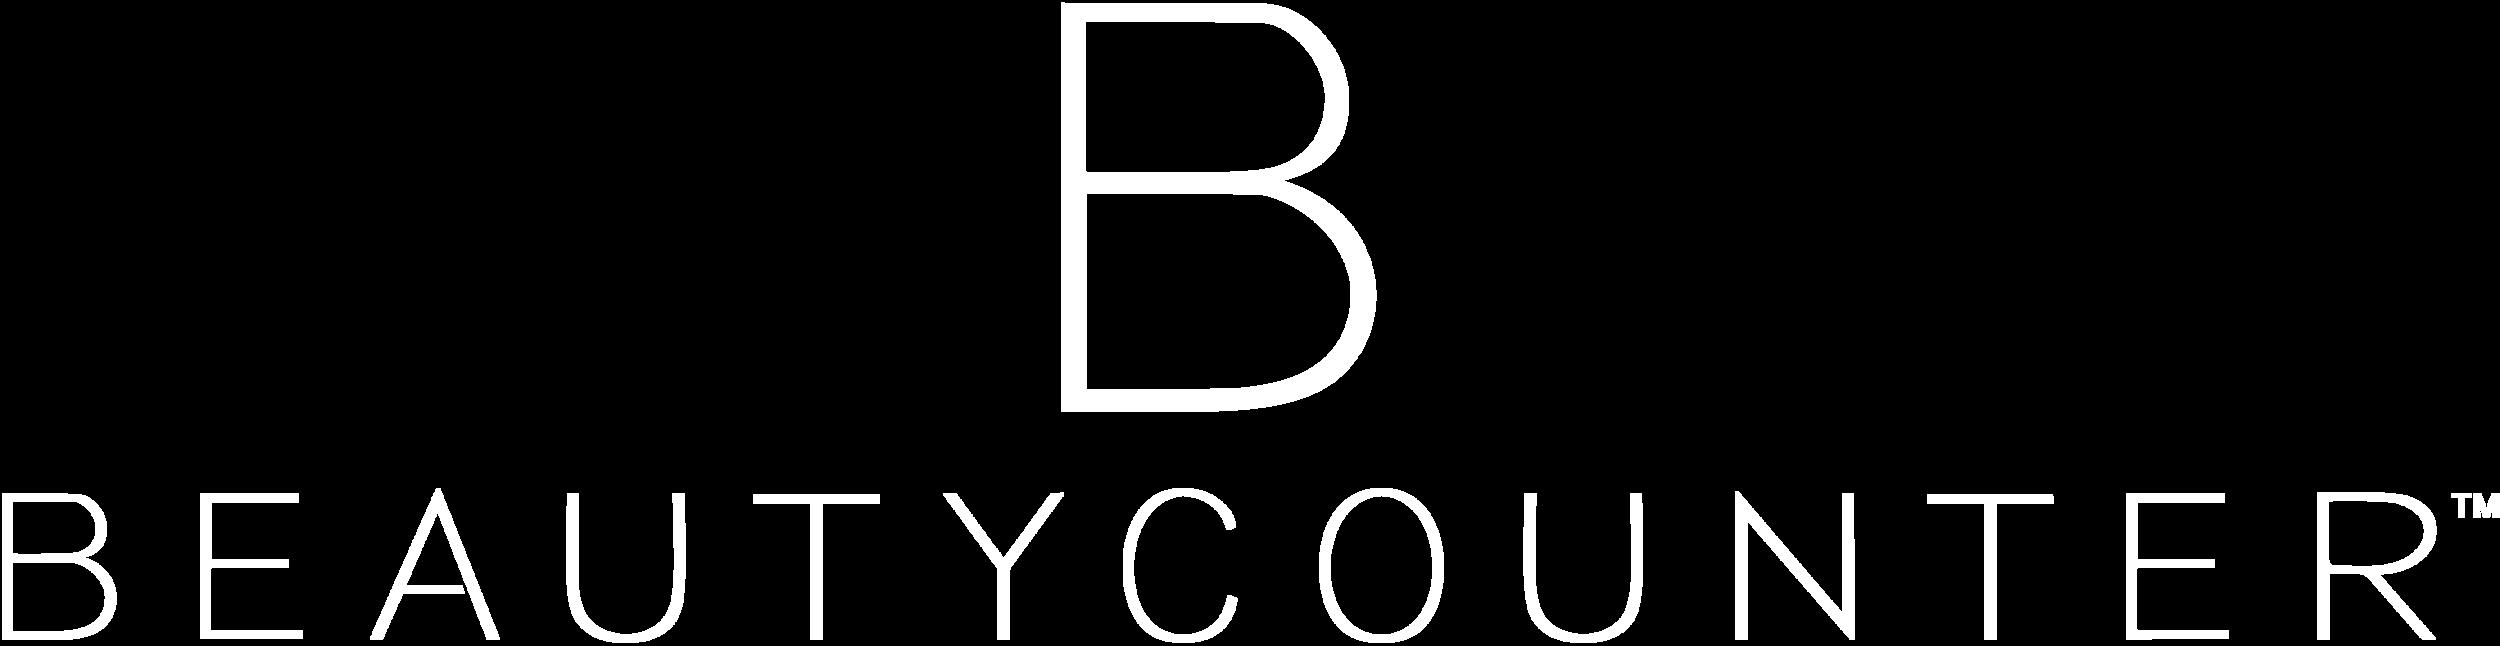 Beautycounter - CA